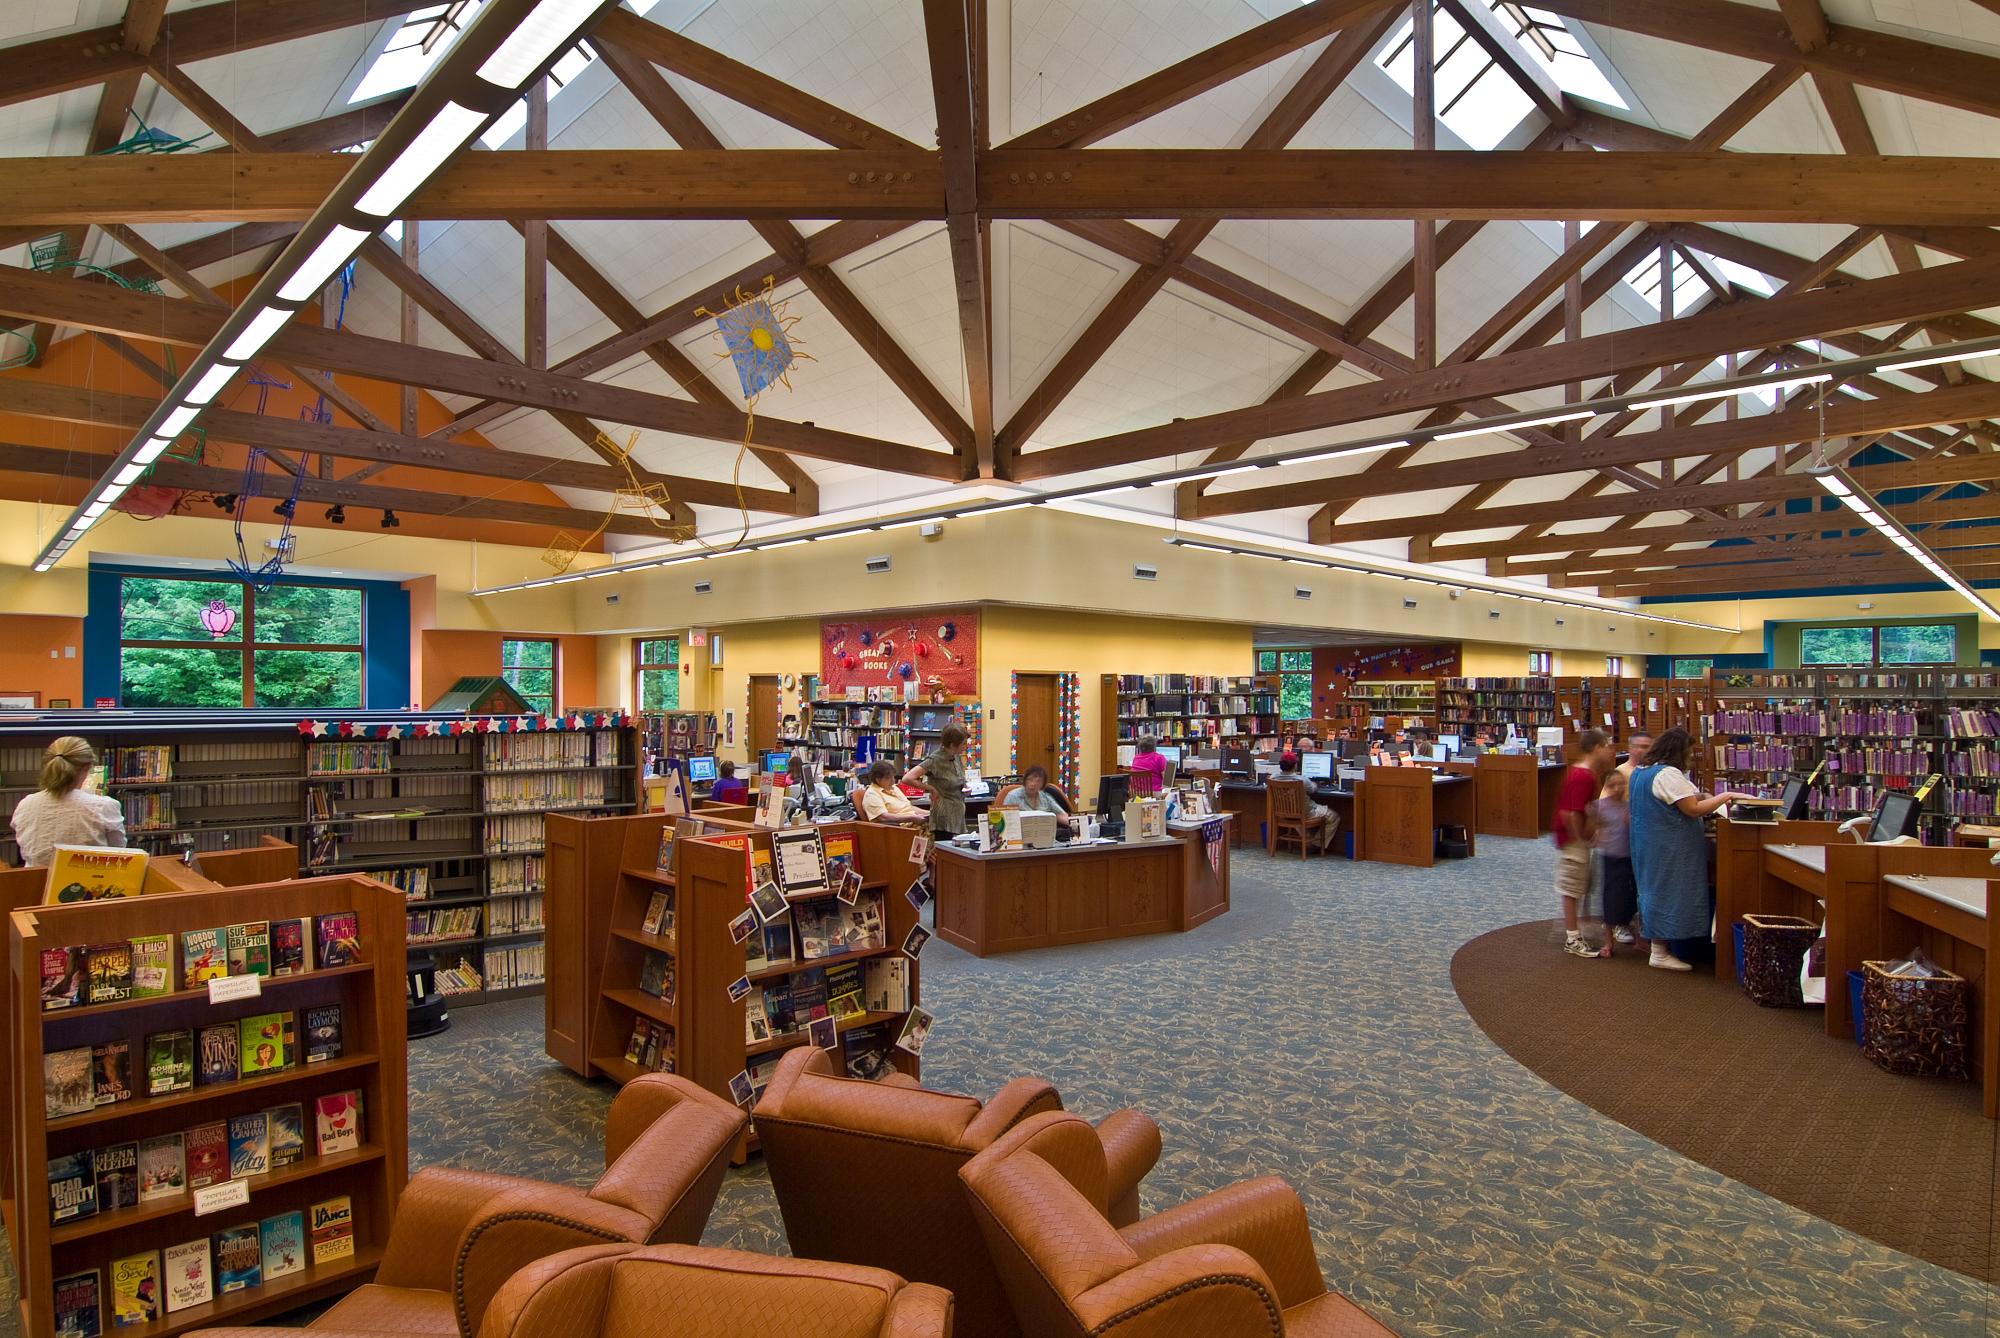 Brecksville_Public Library02.JPG